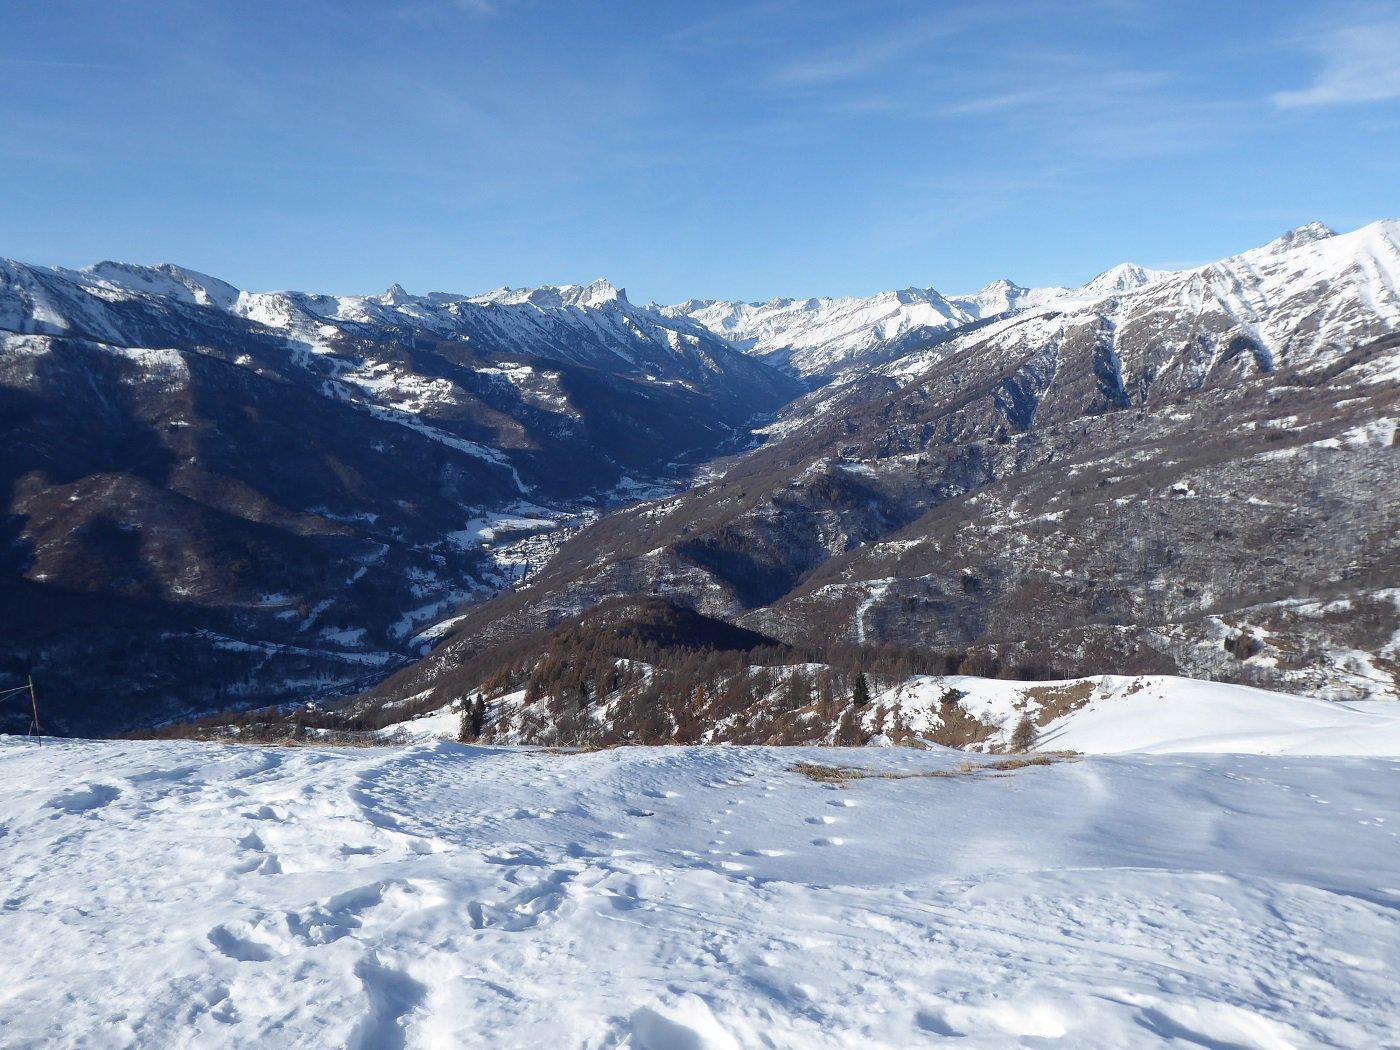 La Val Varaita dalla vetta.